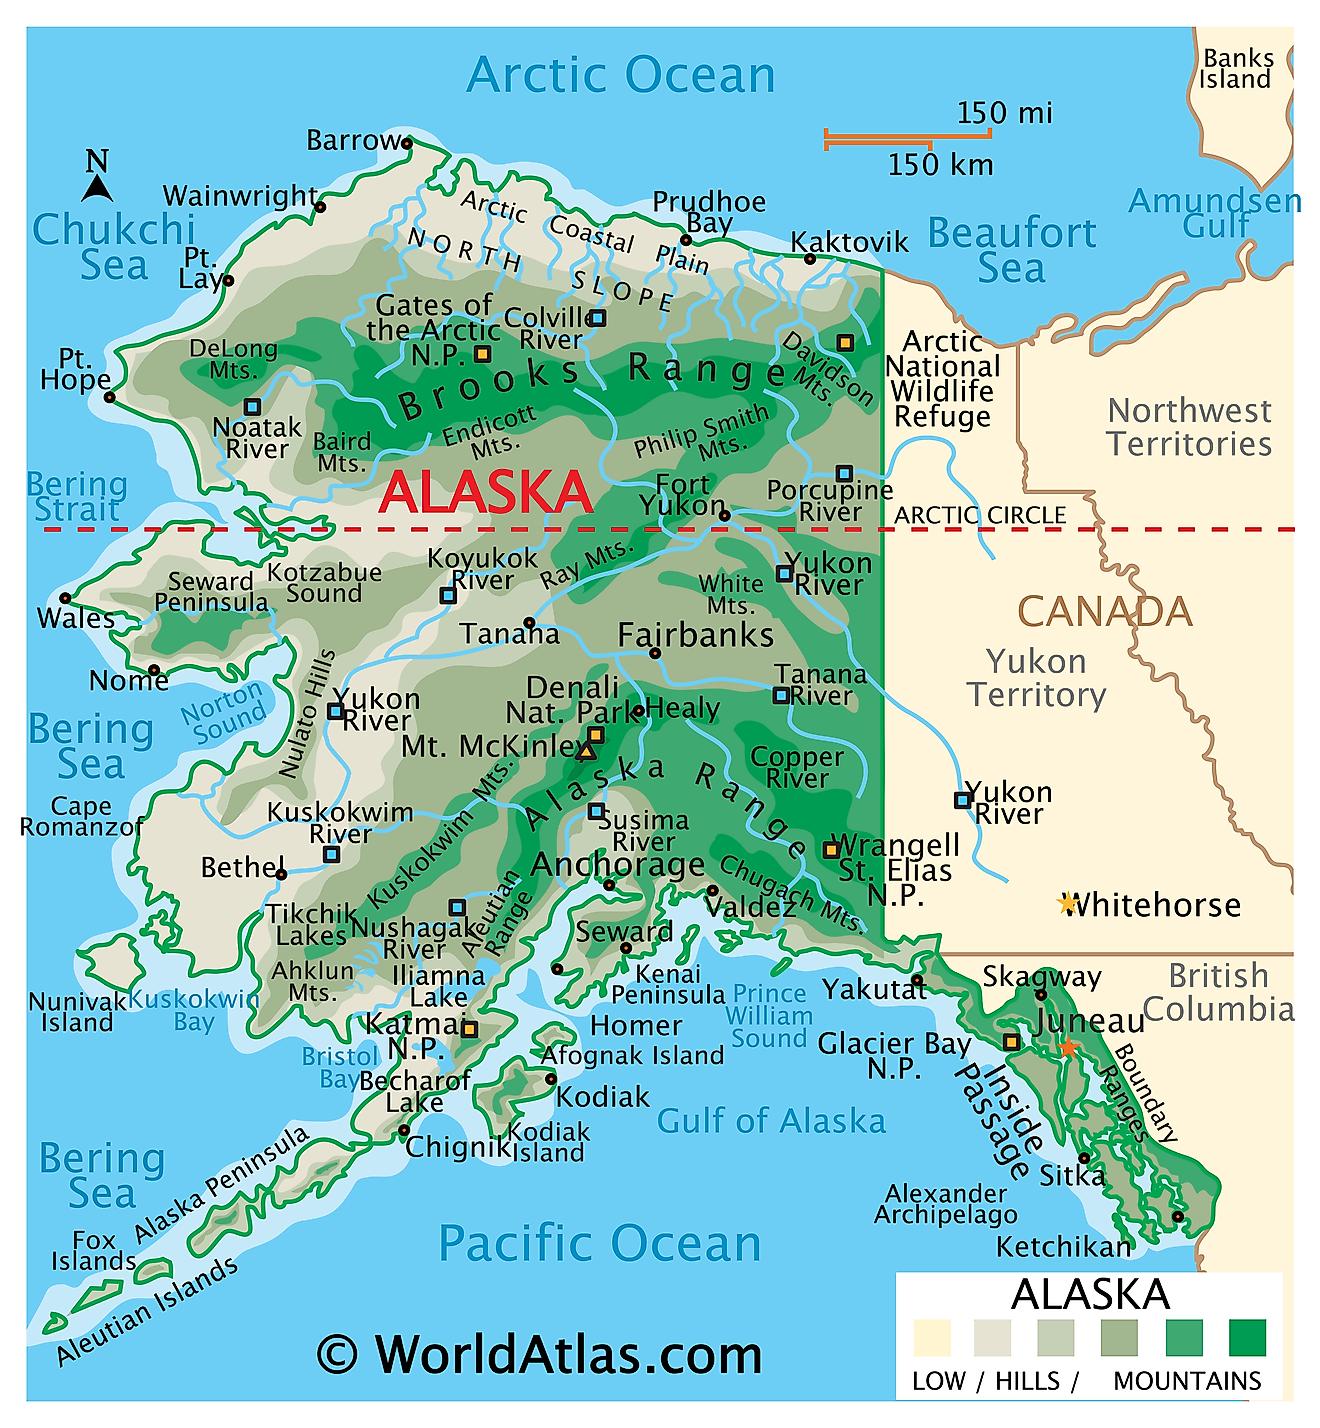 Alaska Maps & Facts